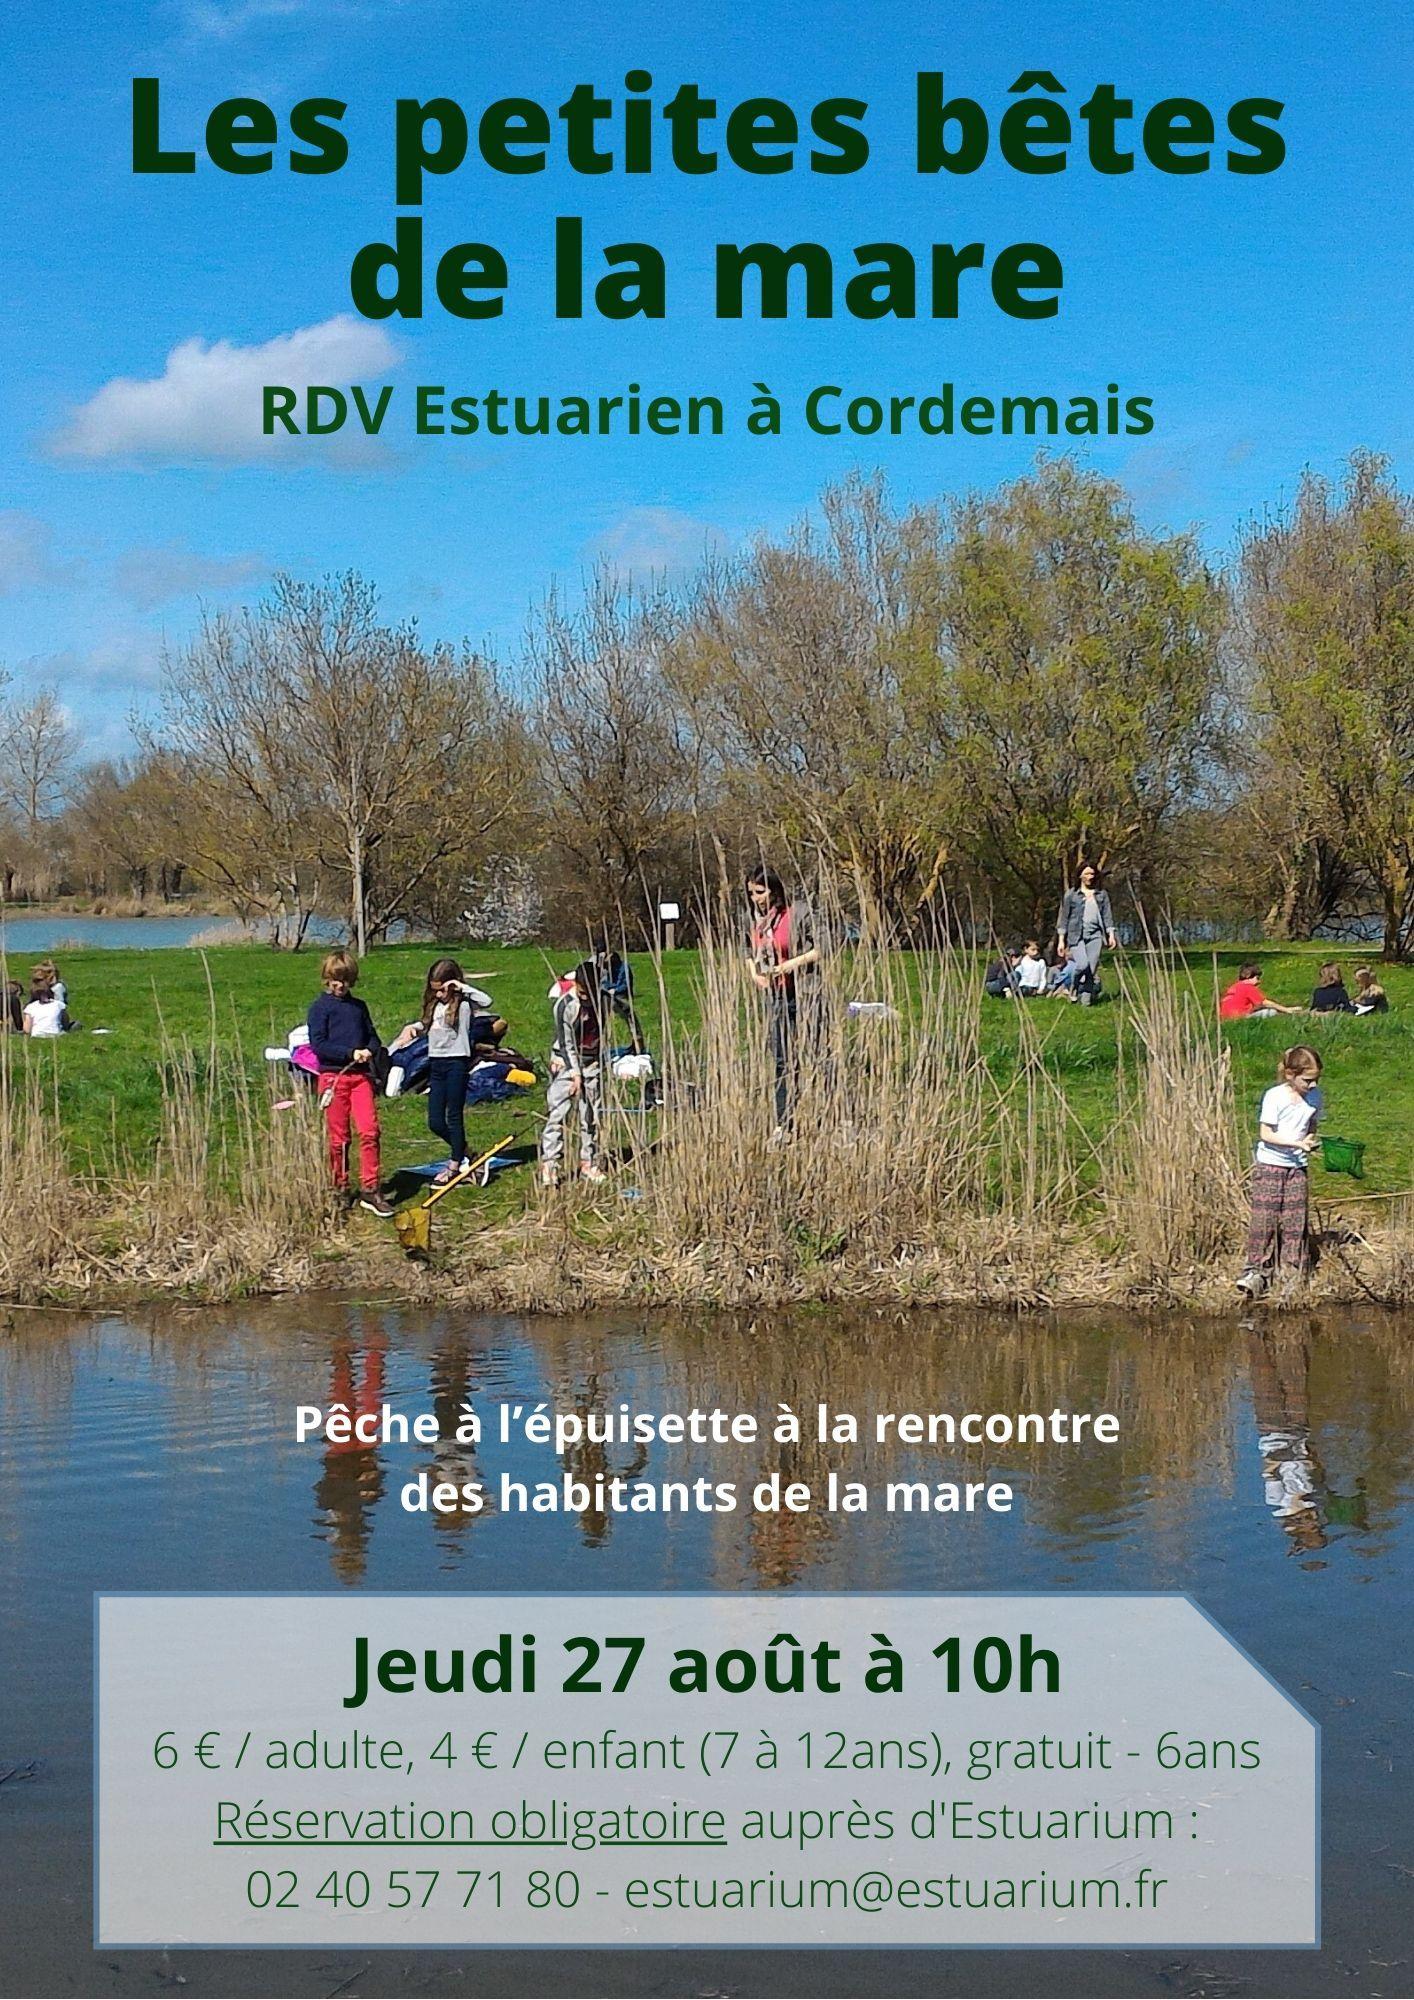 RDV Estuarien août 2020 - Mare - CORDEMAIS